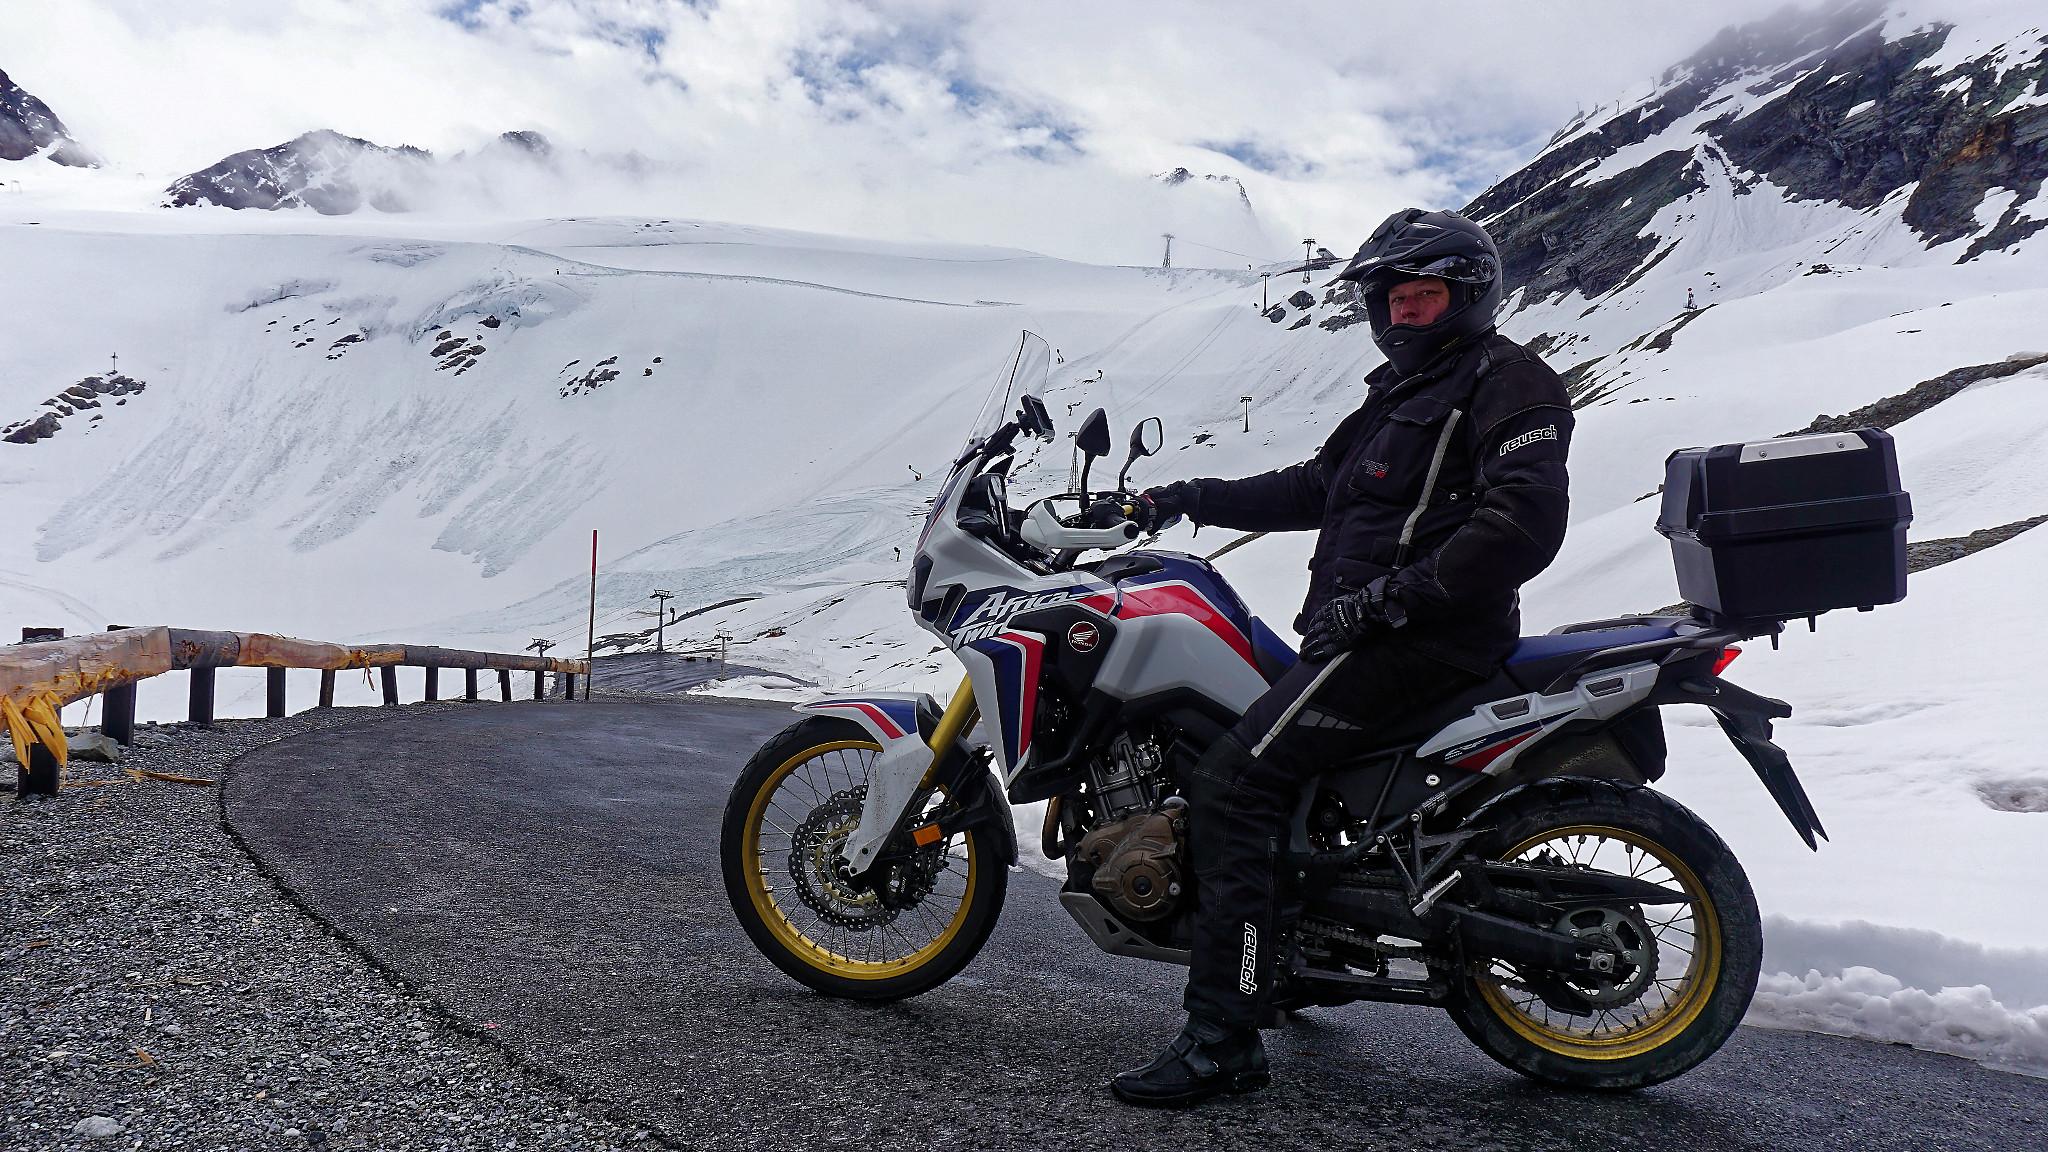 Ötztaler Gletscherstraße